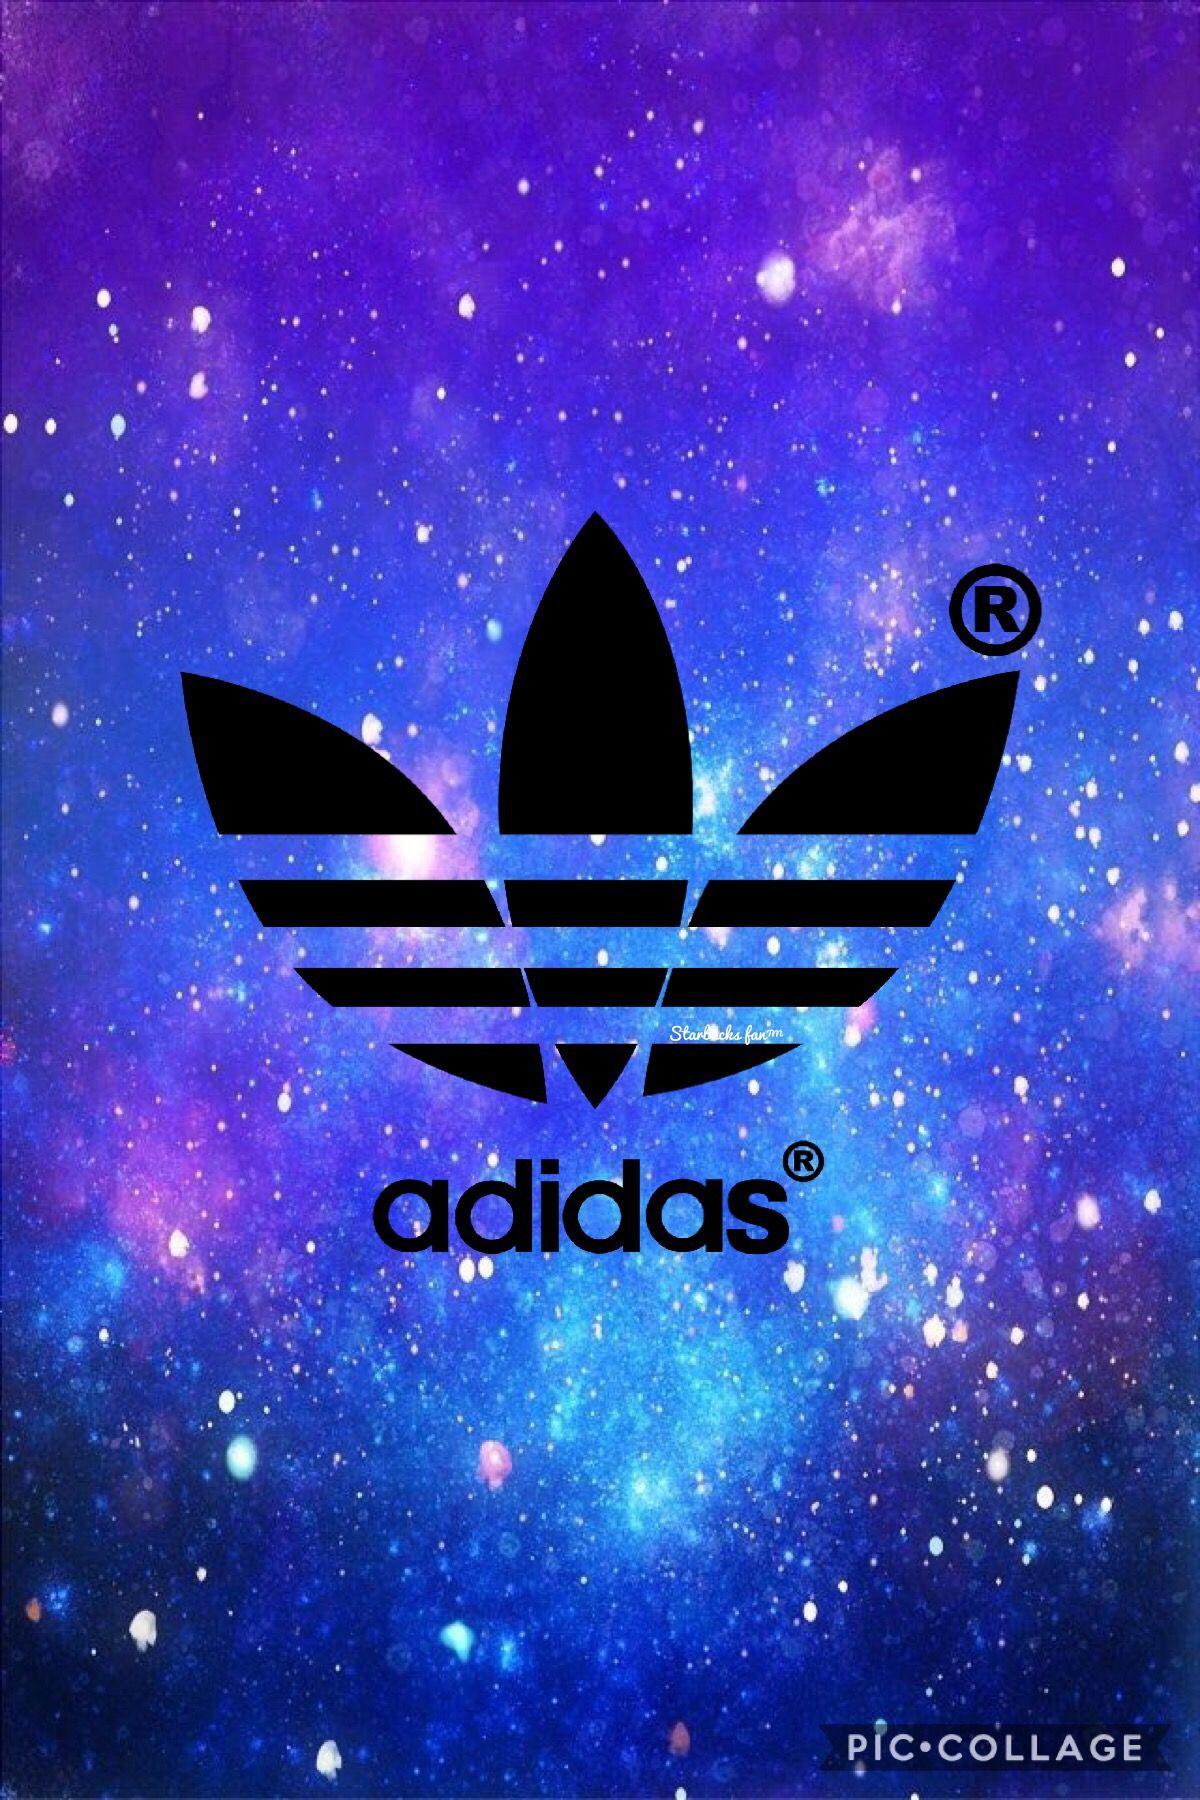 Adidas Wallpaper IPhone Wallpaper IPhone Adidas